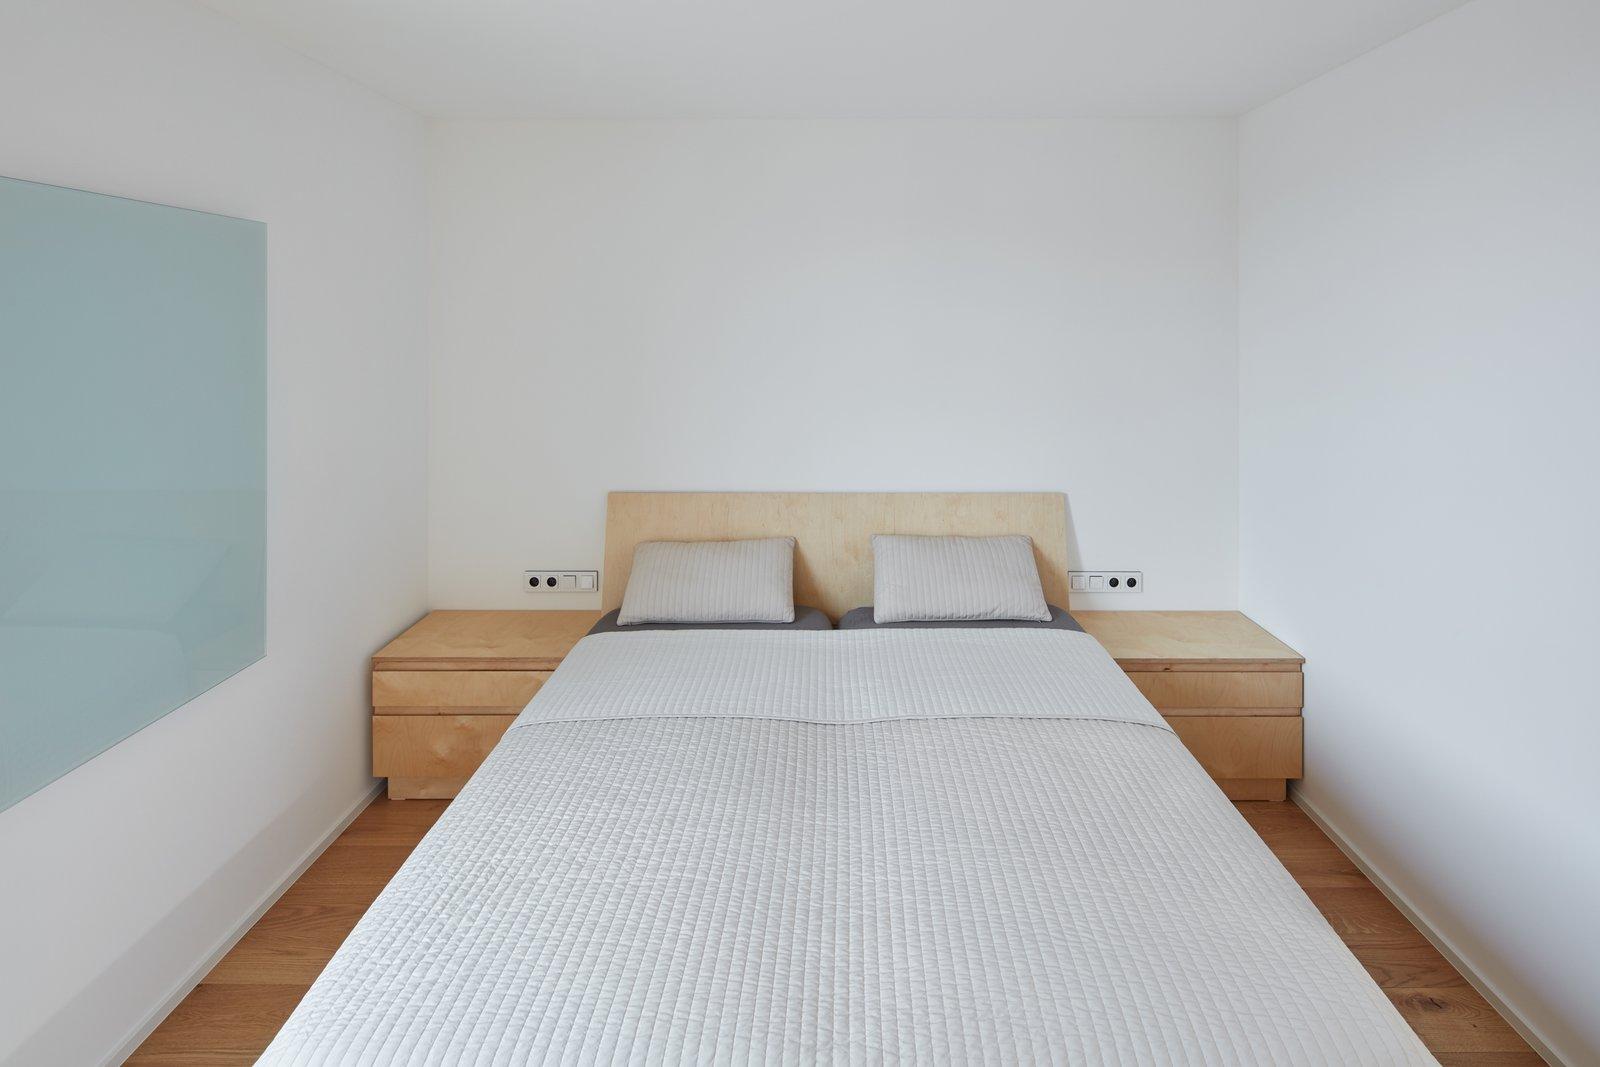 Bedroom, Ceiling Lighting, Bed, Night Stands, and Medium Hardwood Floor  Freedomek No.061 by BoysPlayNice Photography & Concept